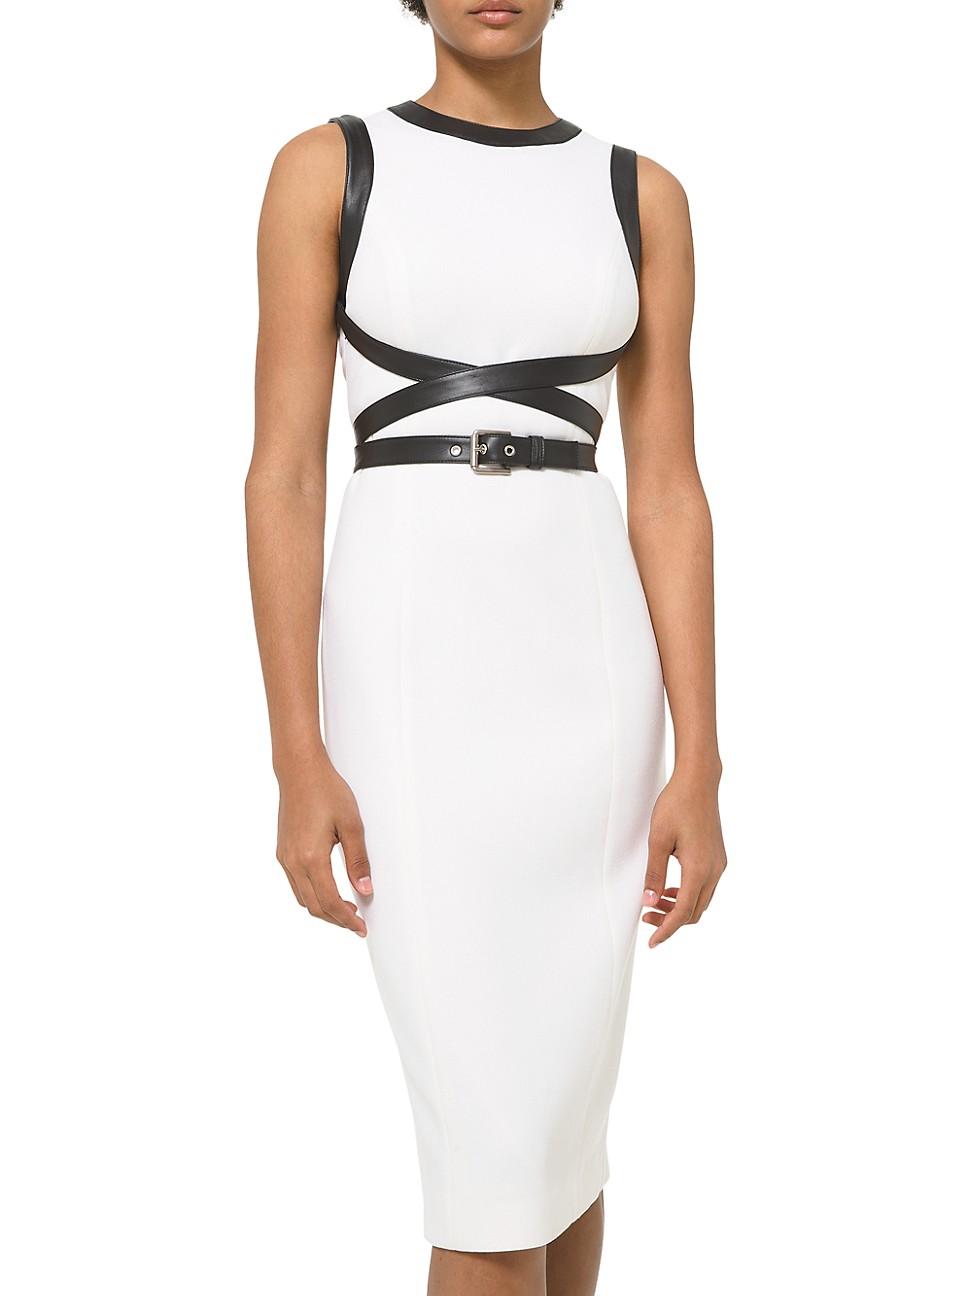 Michael Kors Women's Stretch Bouclé Crisscross Leather Belted Sheath Dress In White Black